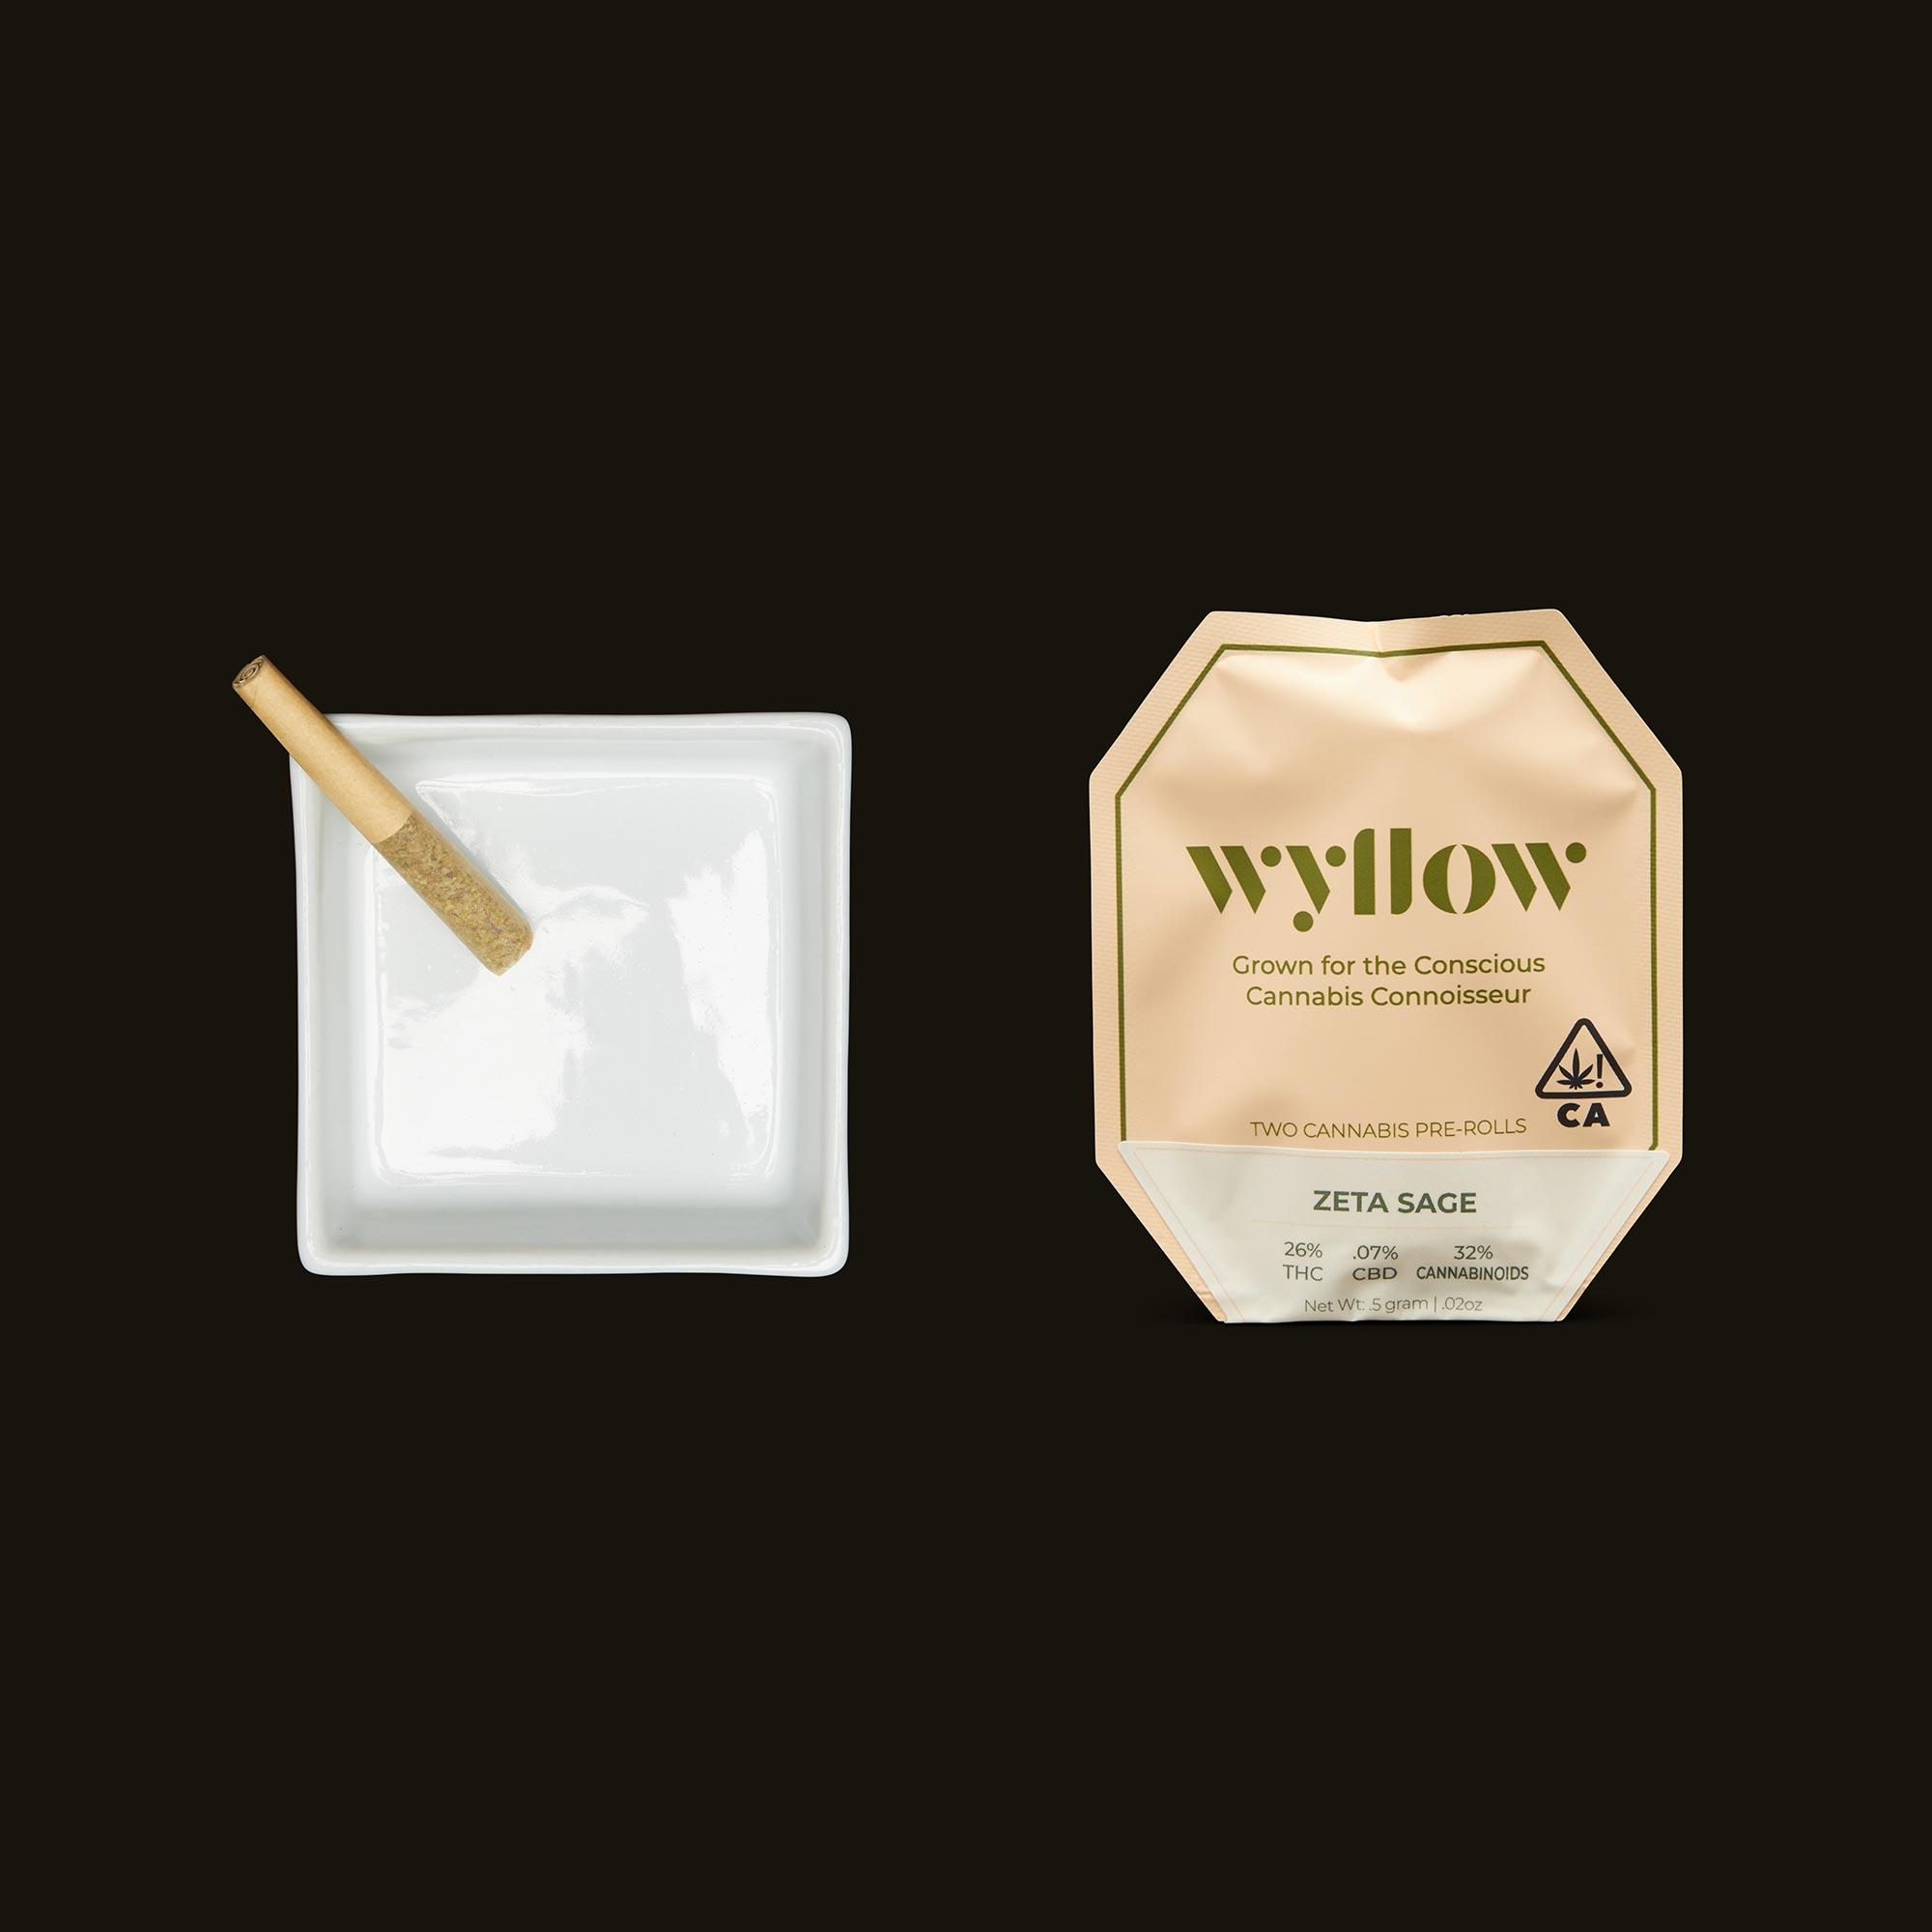 Wyllow Zeta Sage Pre-Rolls